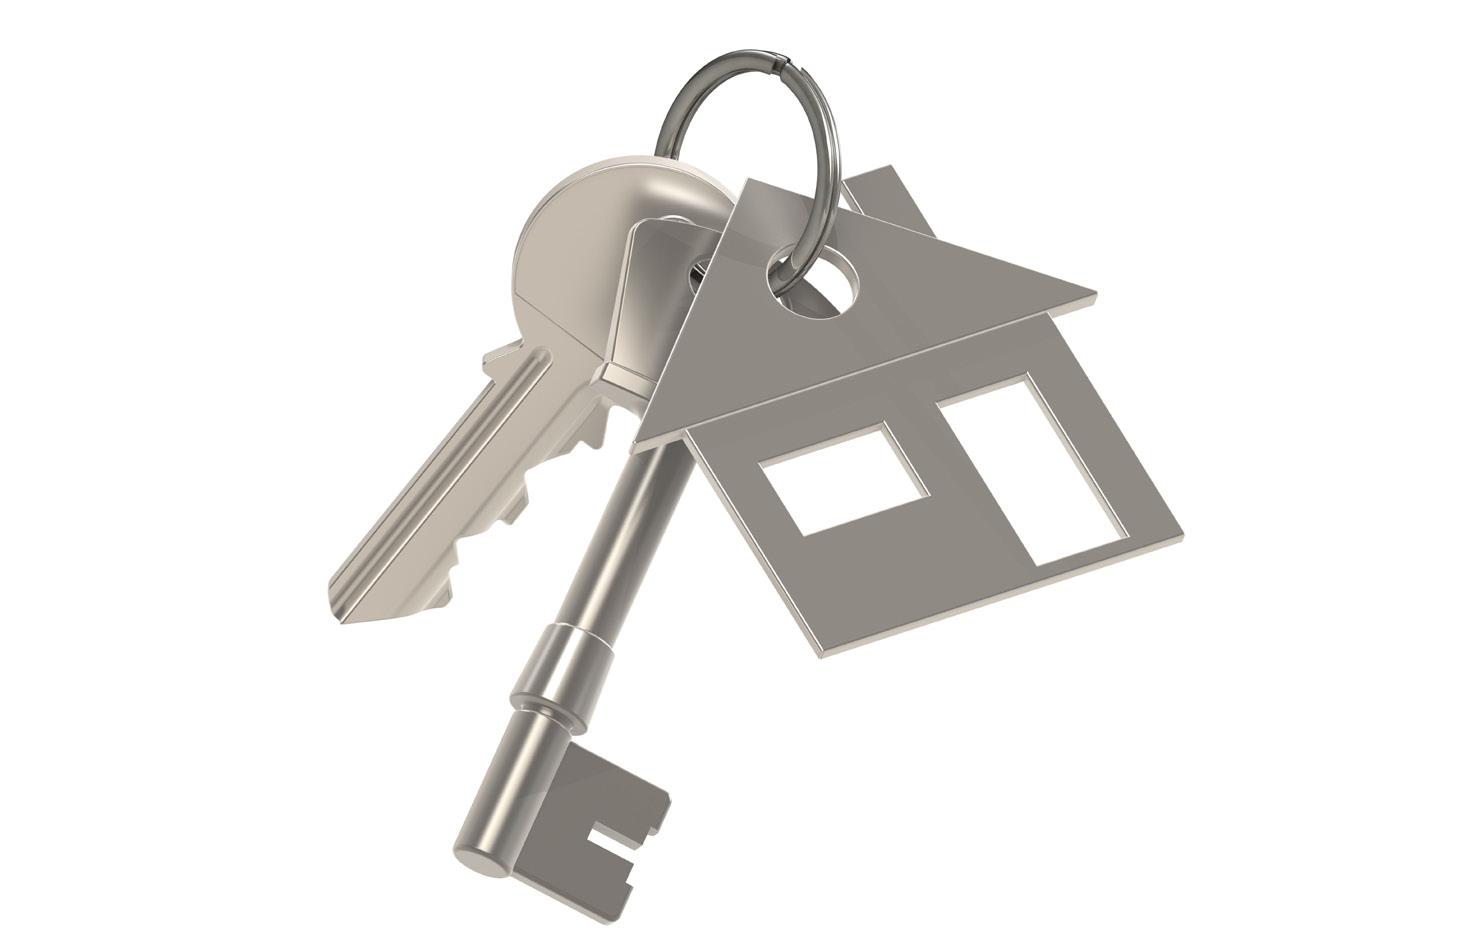 Inmobiliaria azpiroz inmobiliaria en pamplona venta de - Inmobiliaria marcos pamplona ...